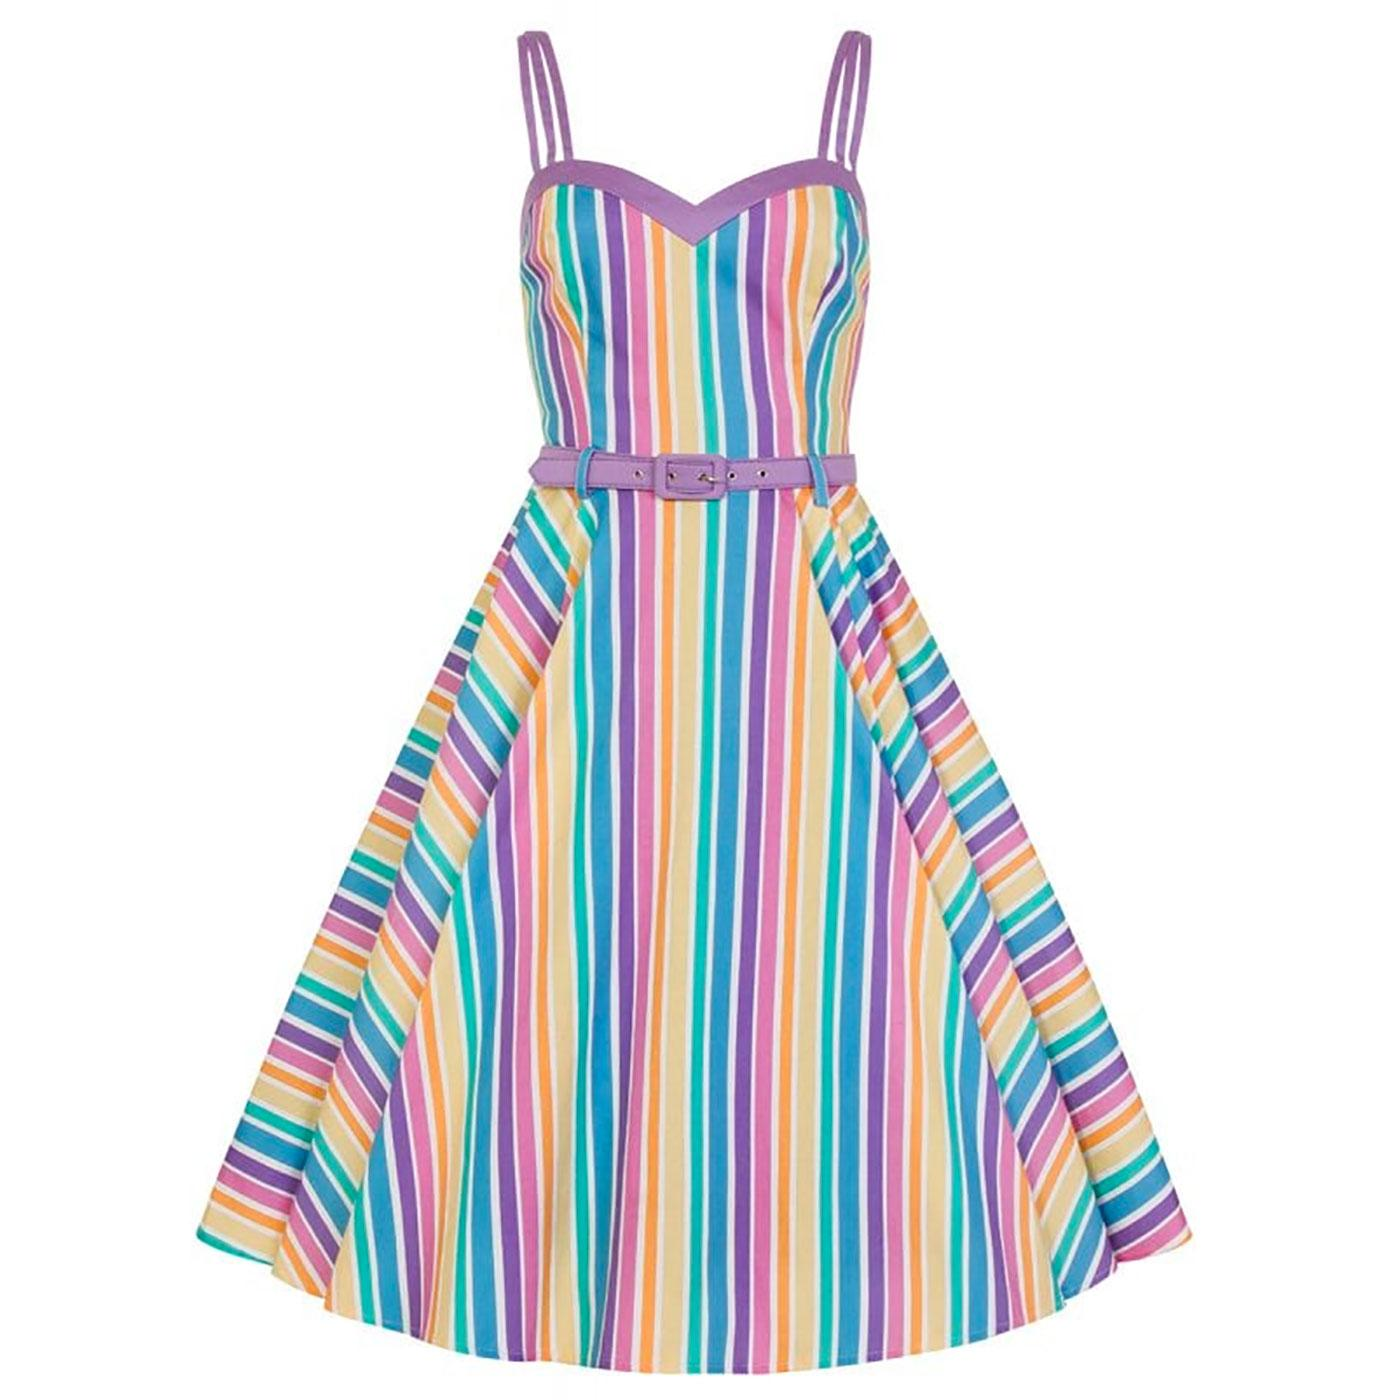 Nova COLLECTIF Retro Rainbow Stripe Swing Dress